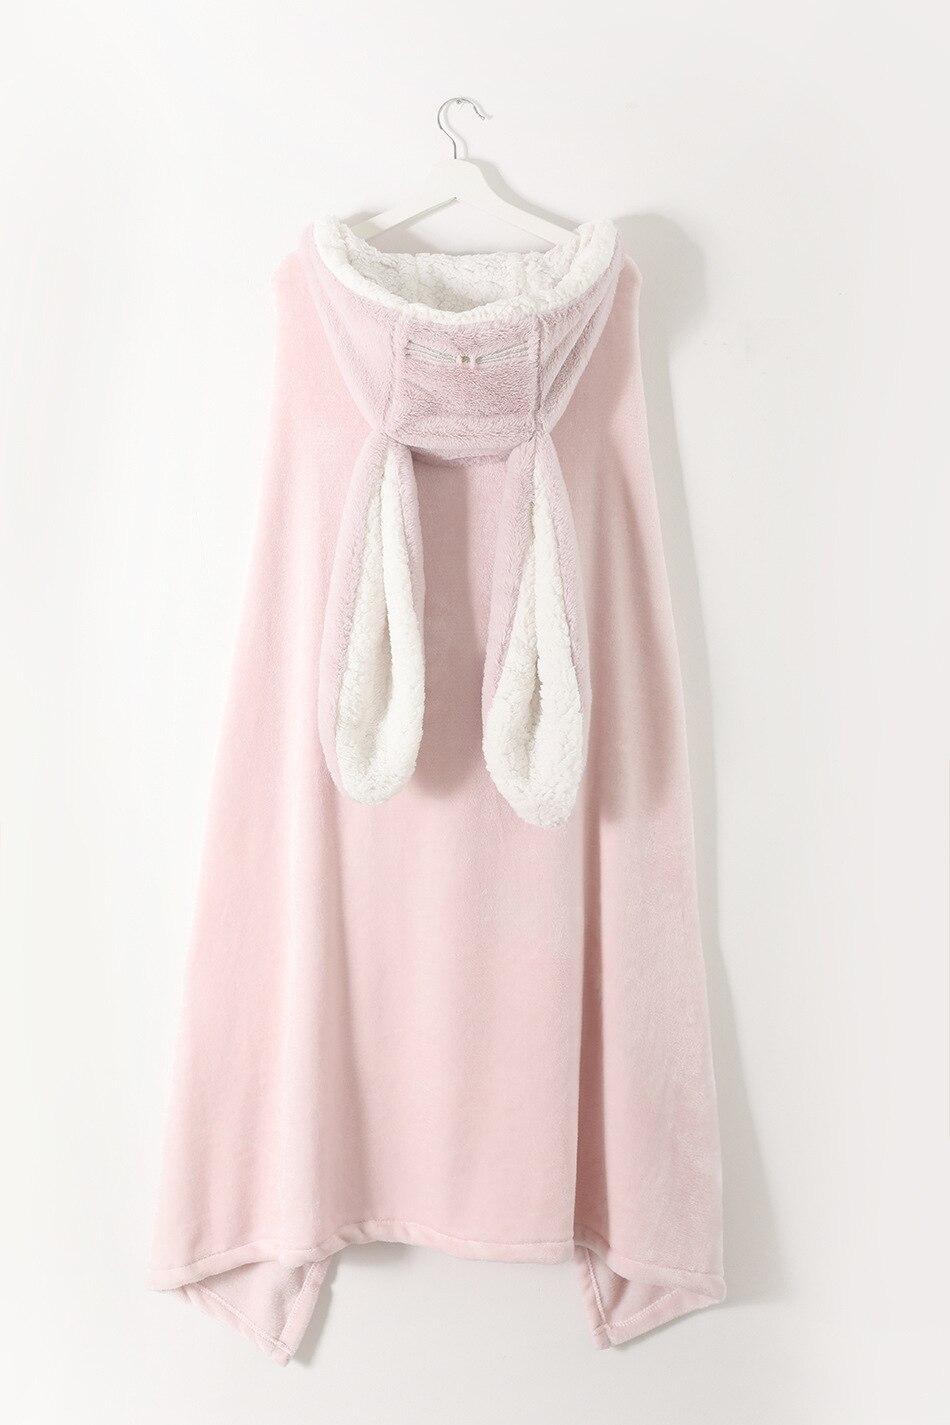 Cute Pink Comfy Blanket Sweatshirt Winter Warm Adults and Children Rabbit Ear Hooded Fleece Blanket Sleepwear Huge Bed Blankets 155